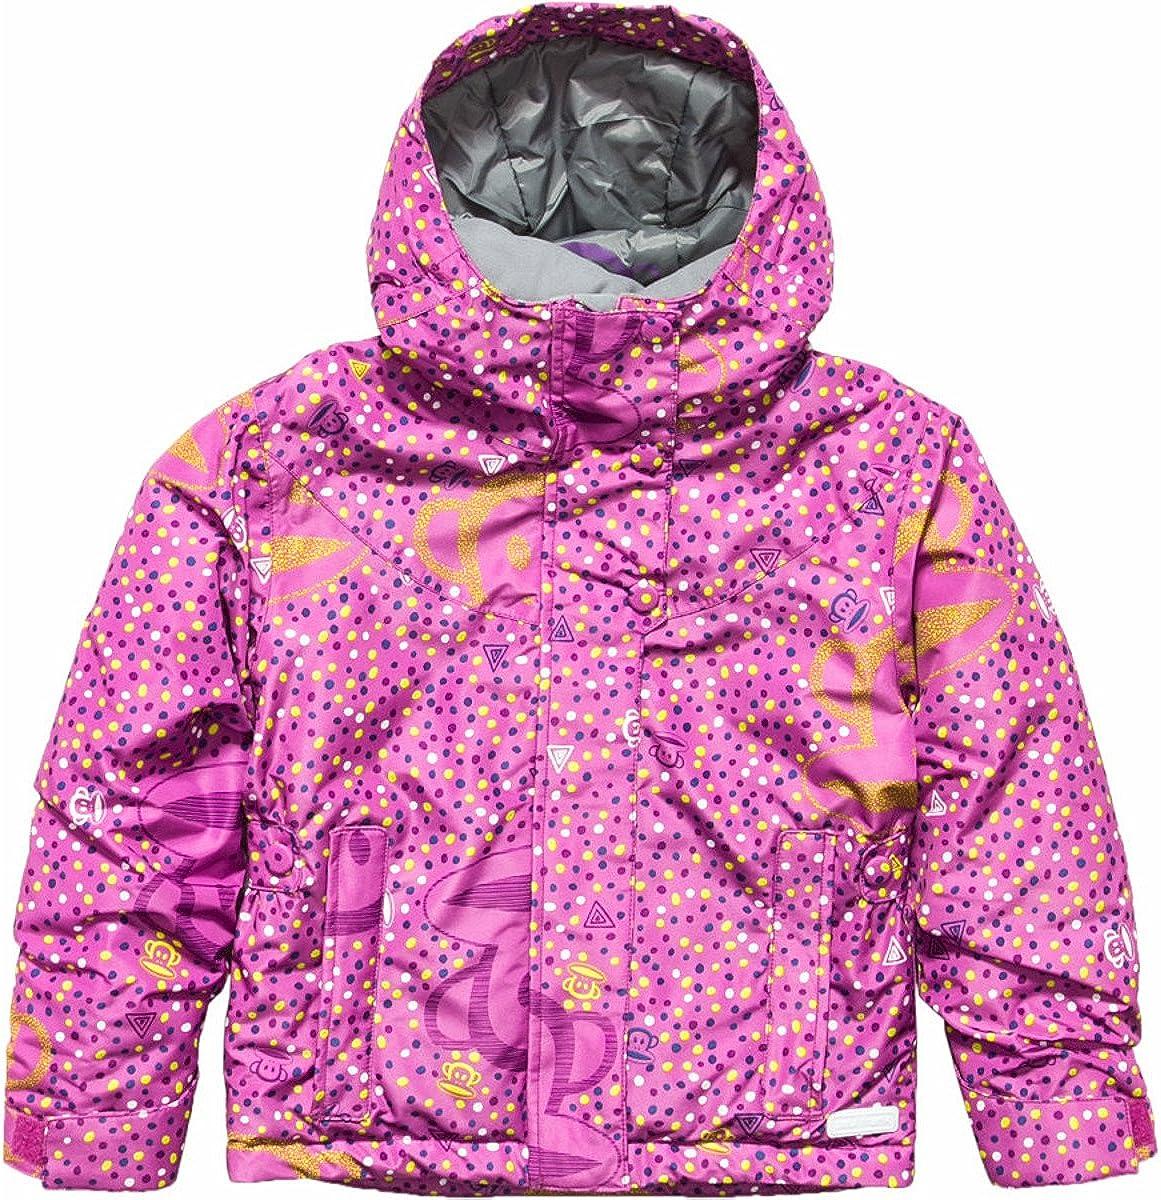 Lowest price challenge Paul security Frank Girl's Julius Pfunfeti Jacket Collage